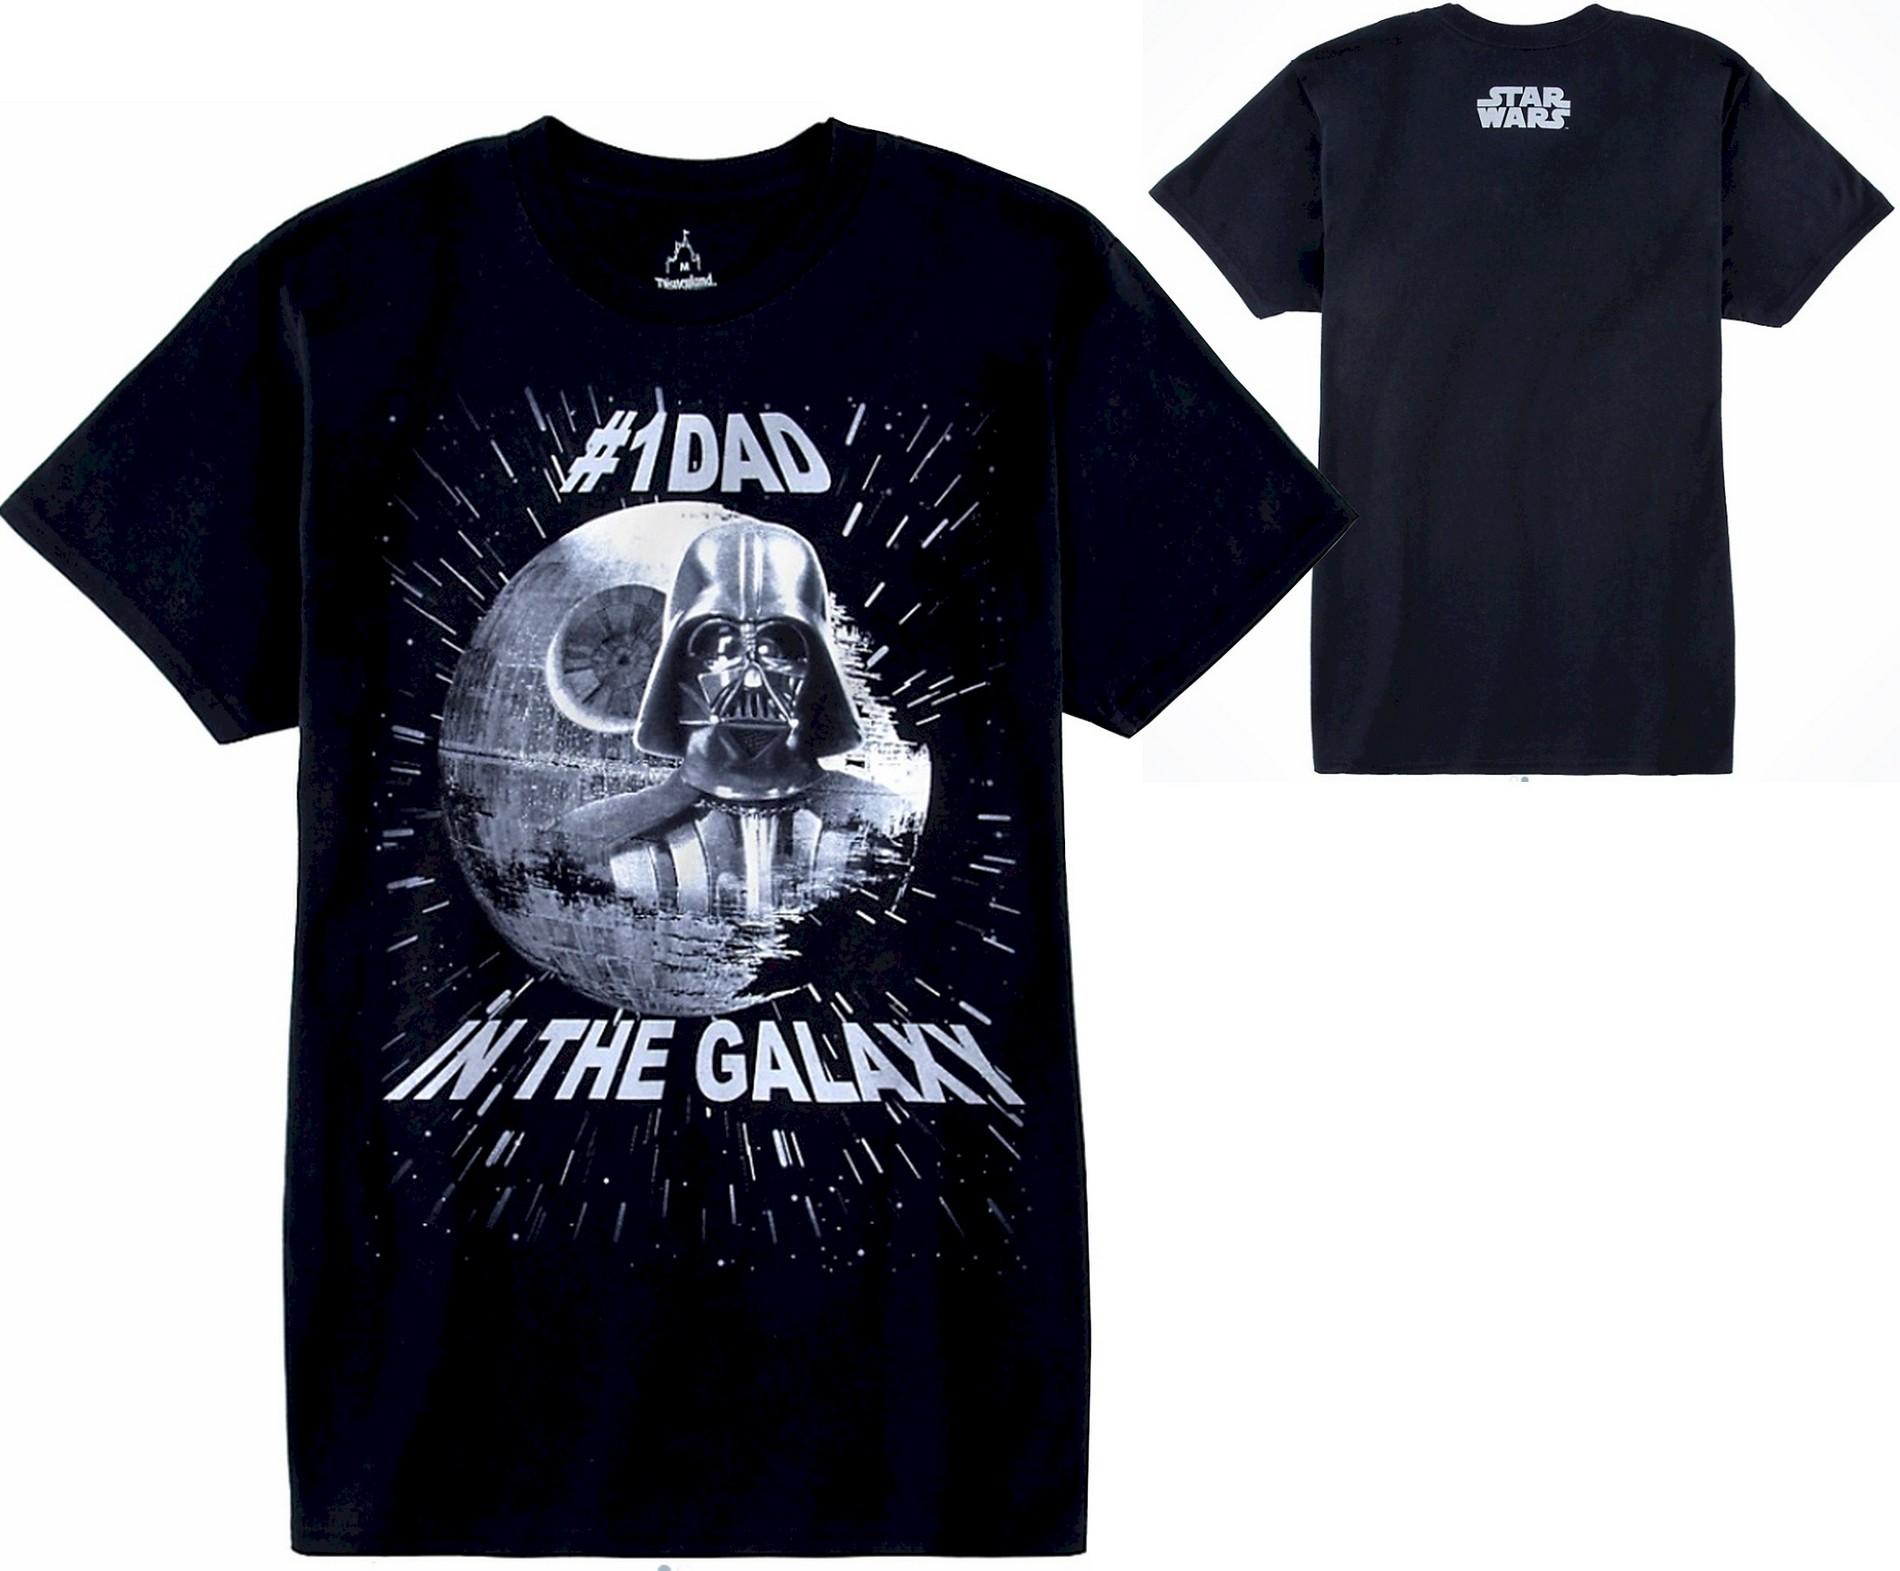 Number 1 Dad In The Galaxy Adult T-Shirt (Tshirt, T shirt or Tee) - Disney's Star Wars © Dizdude.com